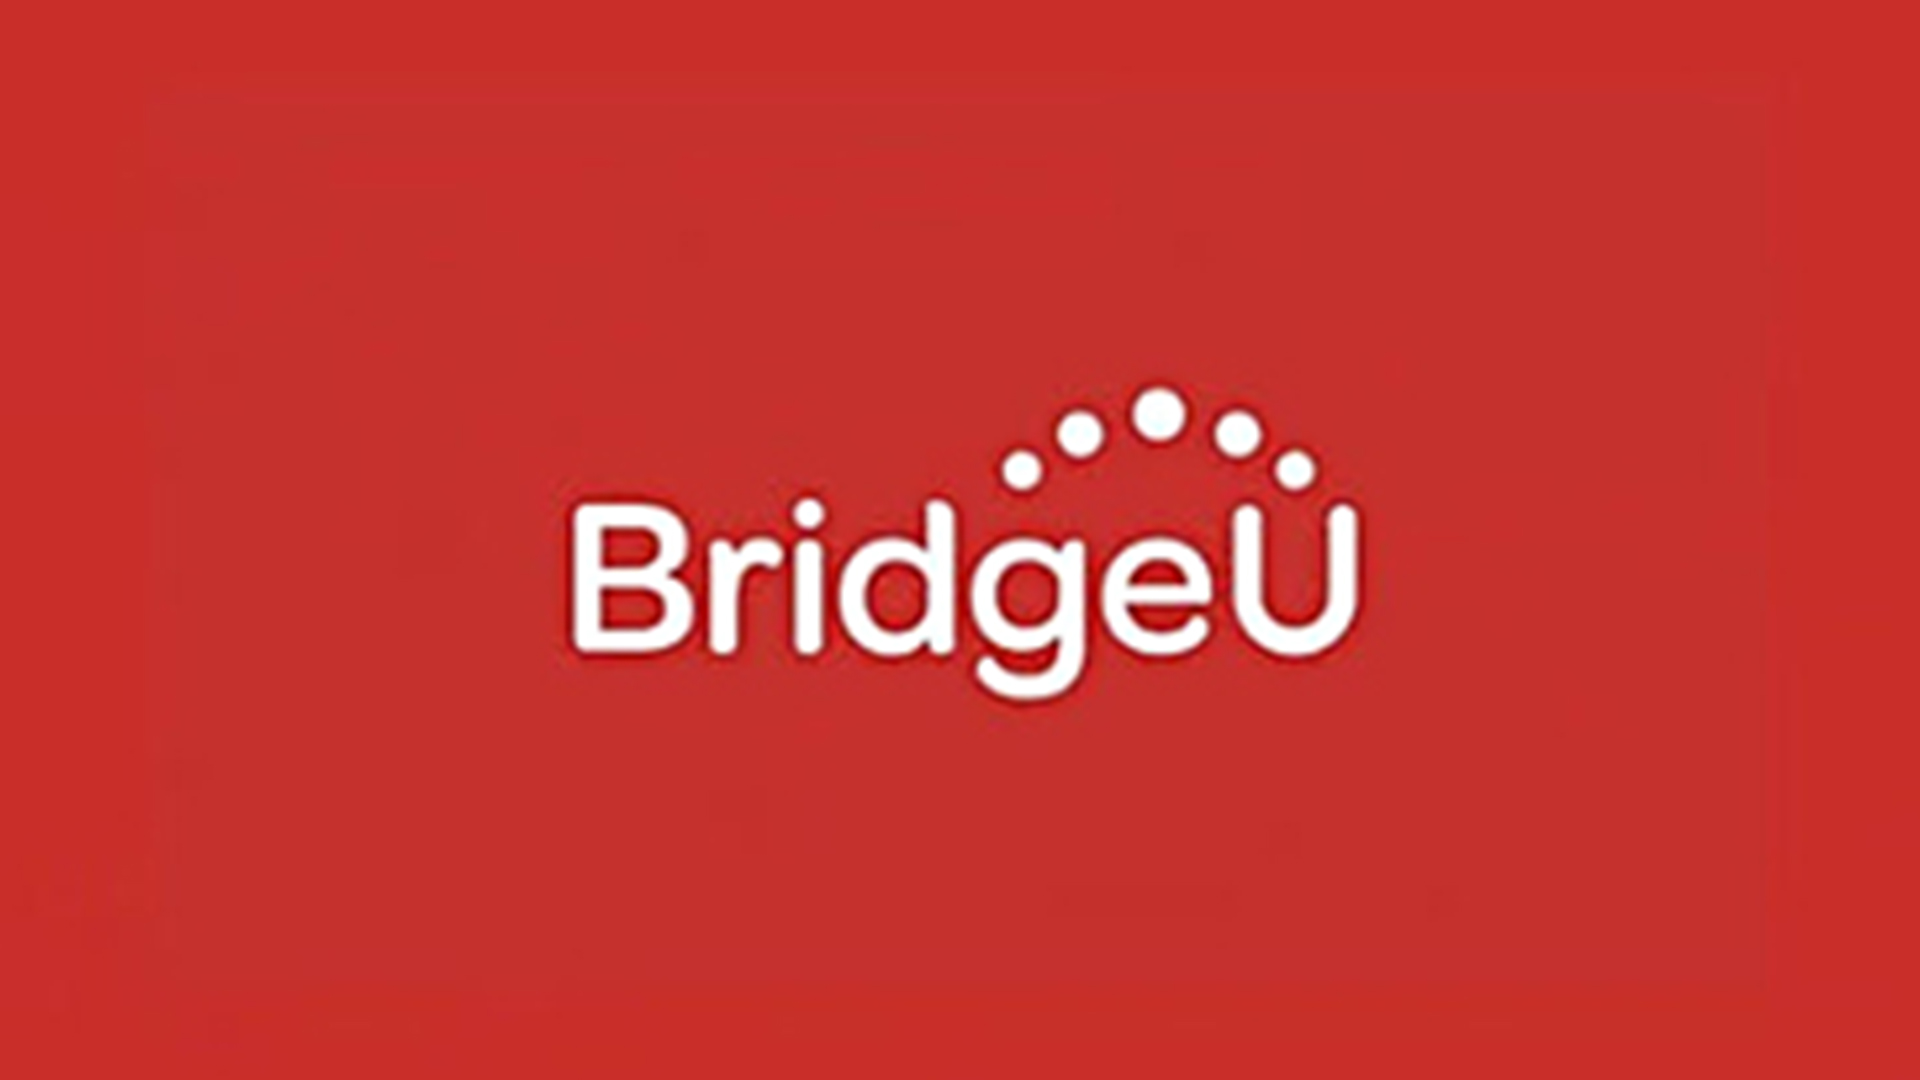 BridgeU